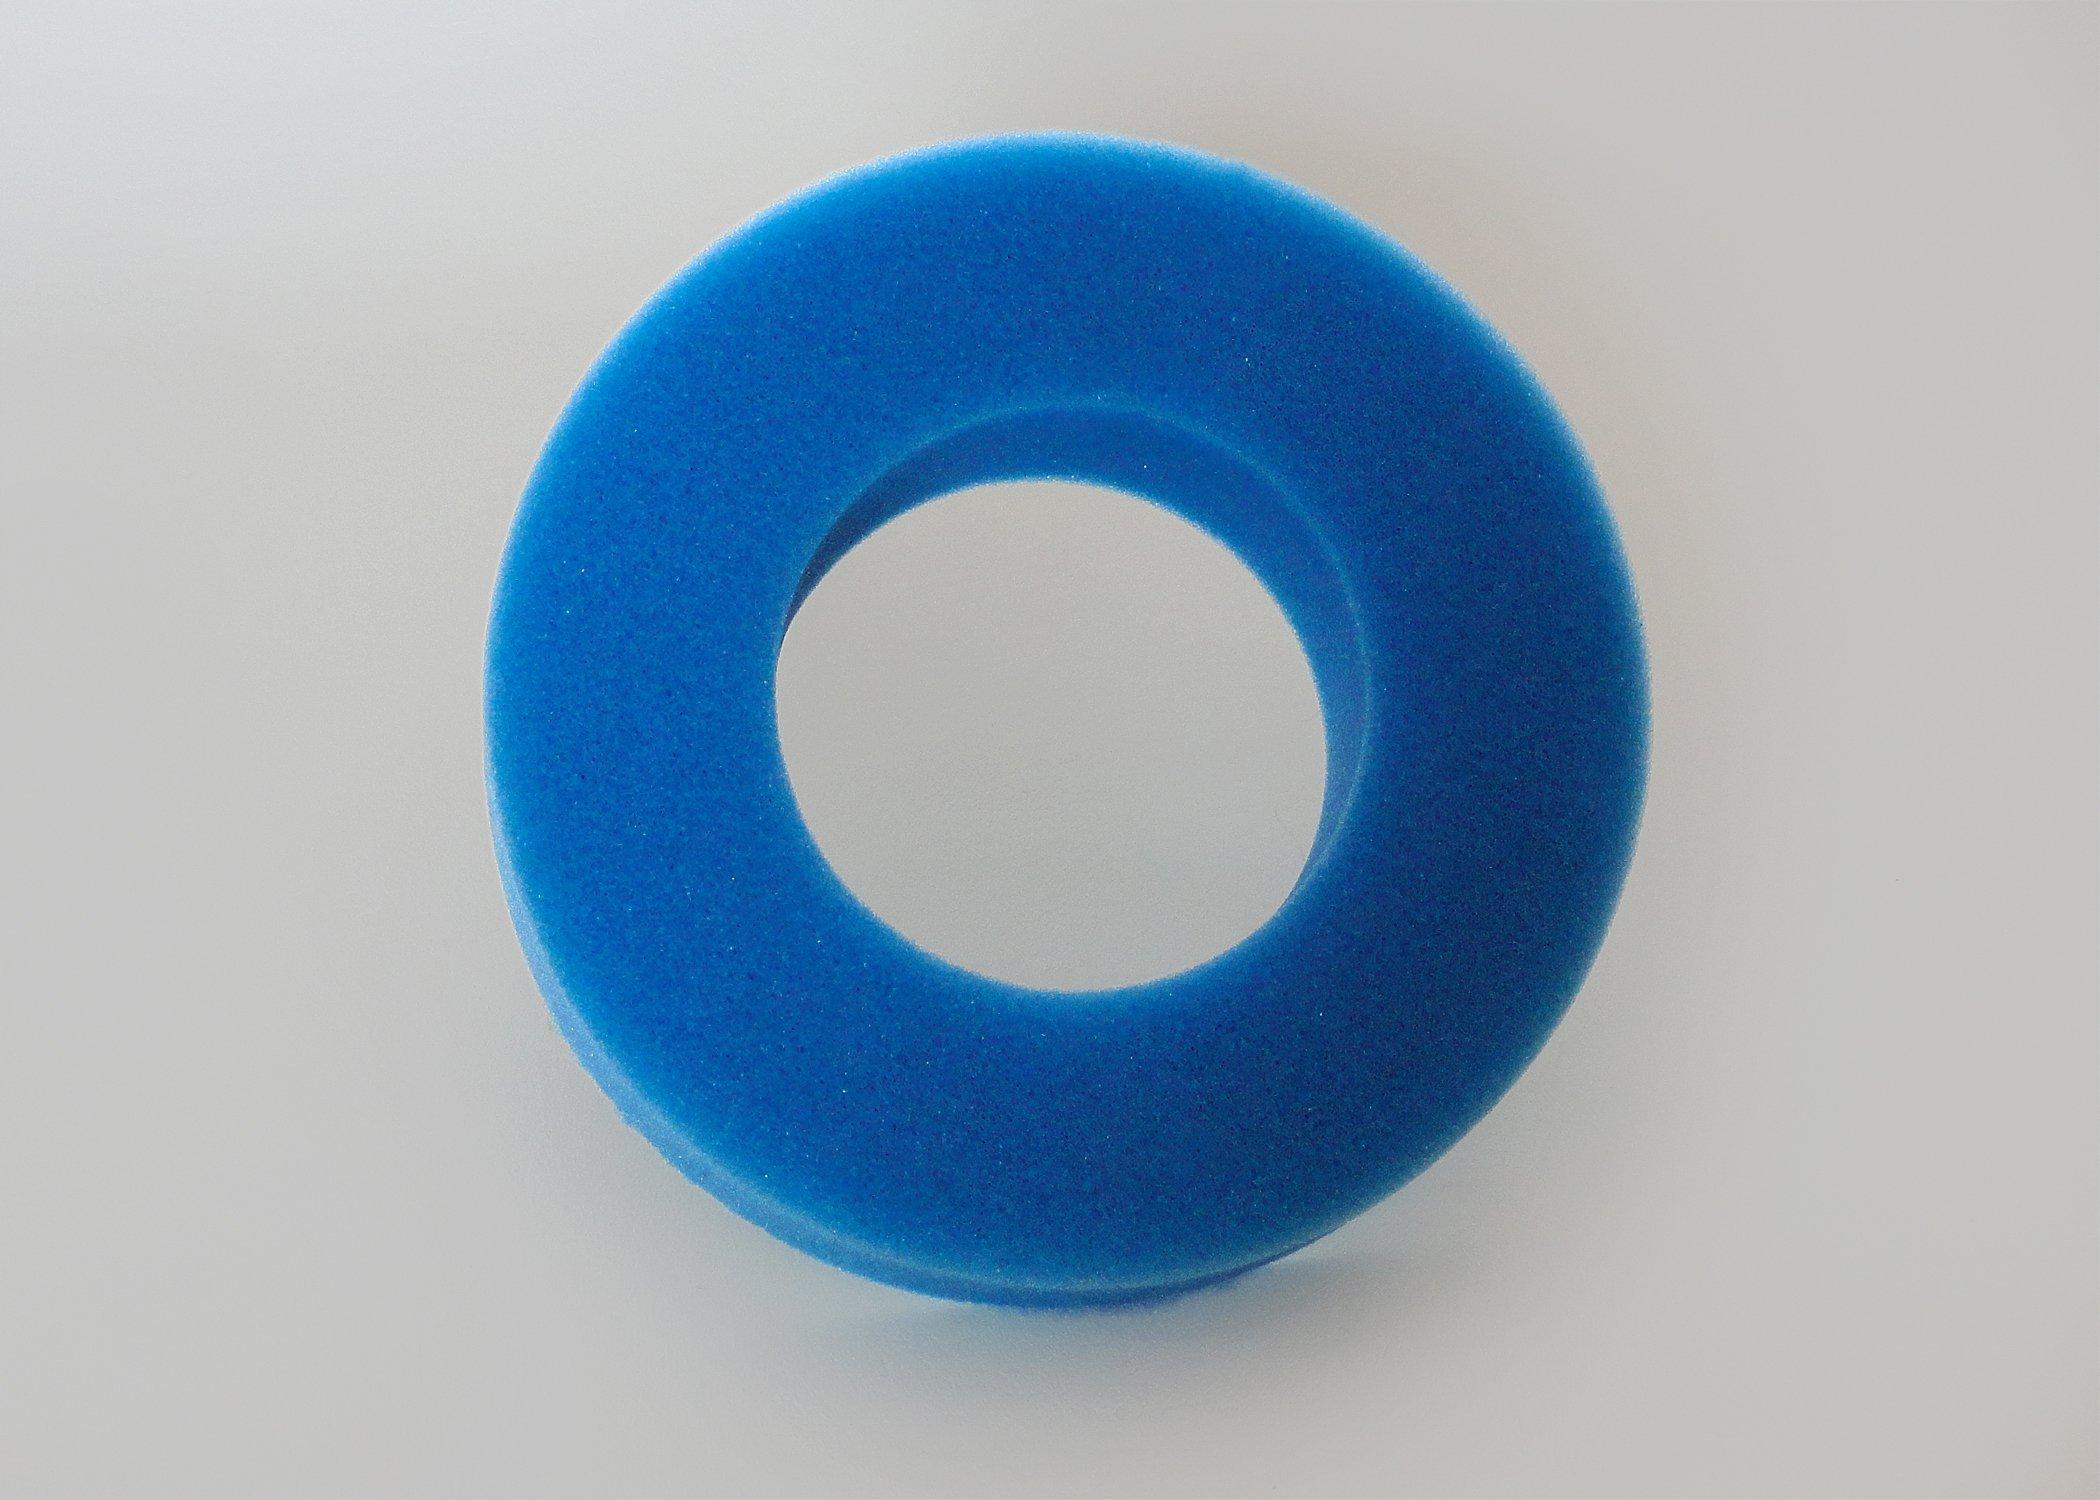 Geneva Healthcare Single-Use Disposable Head Positioner - Single Ring Foam Cushion - 9'' O.D. x 4.5'' I.D. x 2'' - 36/CS